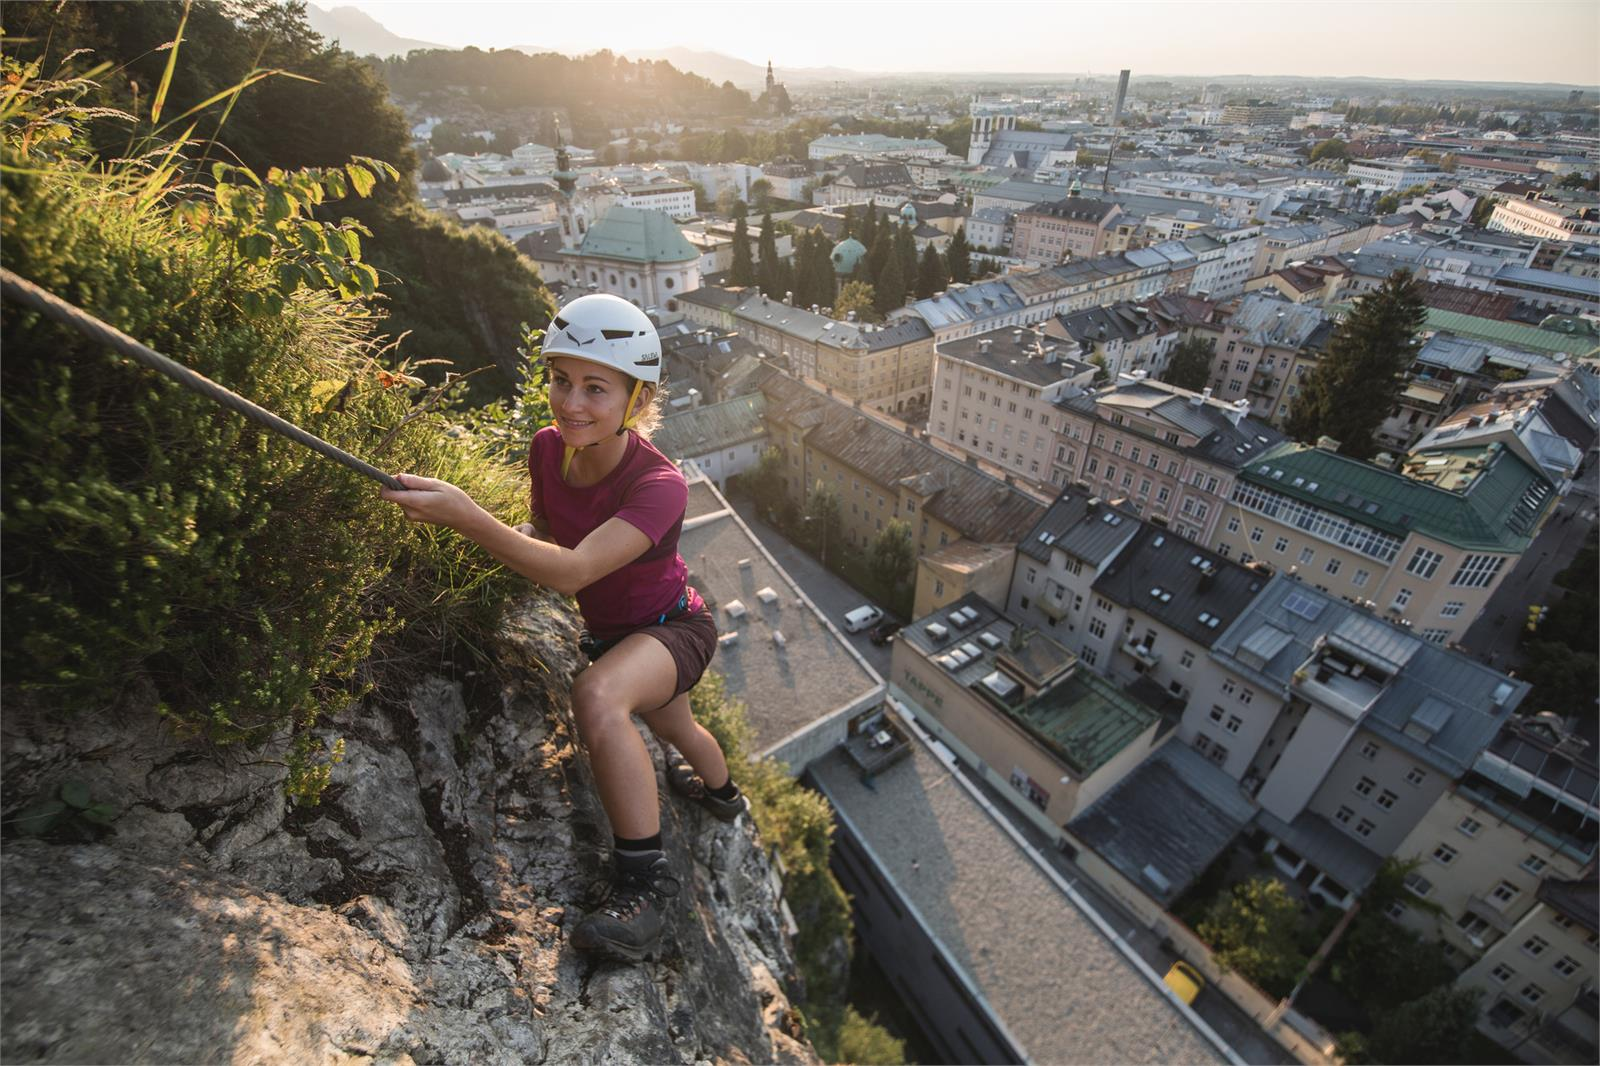 Klettersteig in der Stadt Salzburg   ©SLT - Michael Groessinger